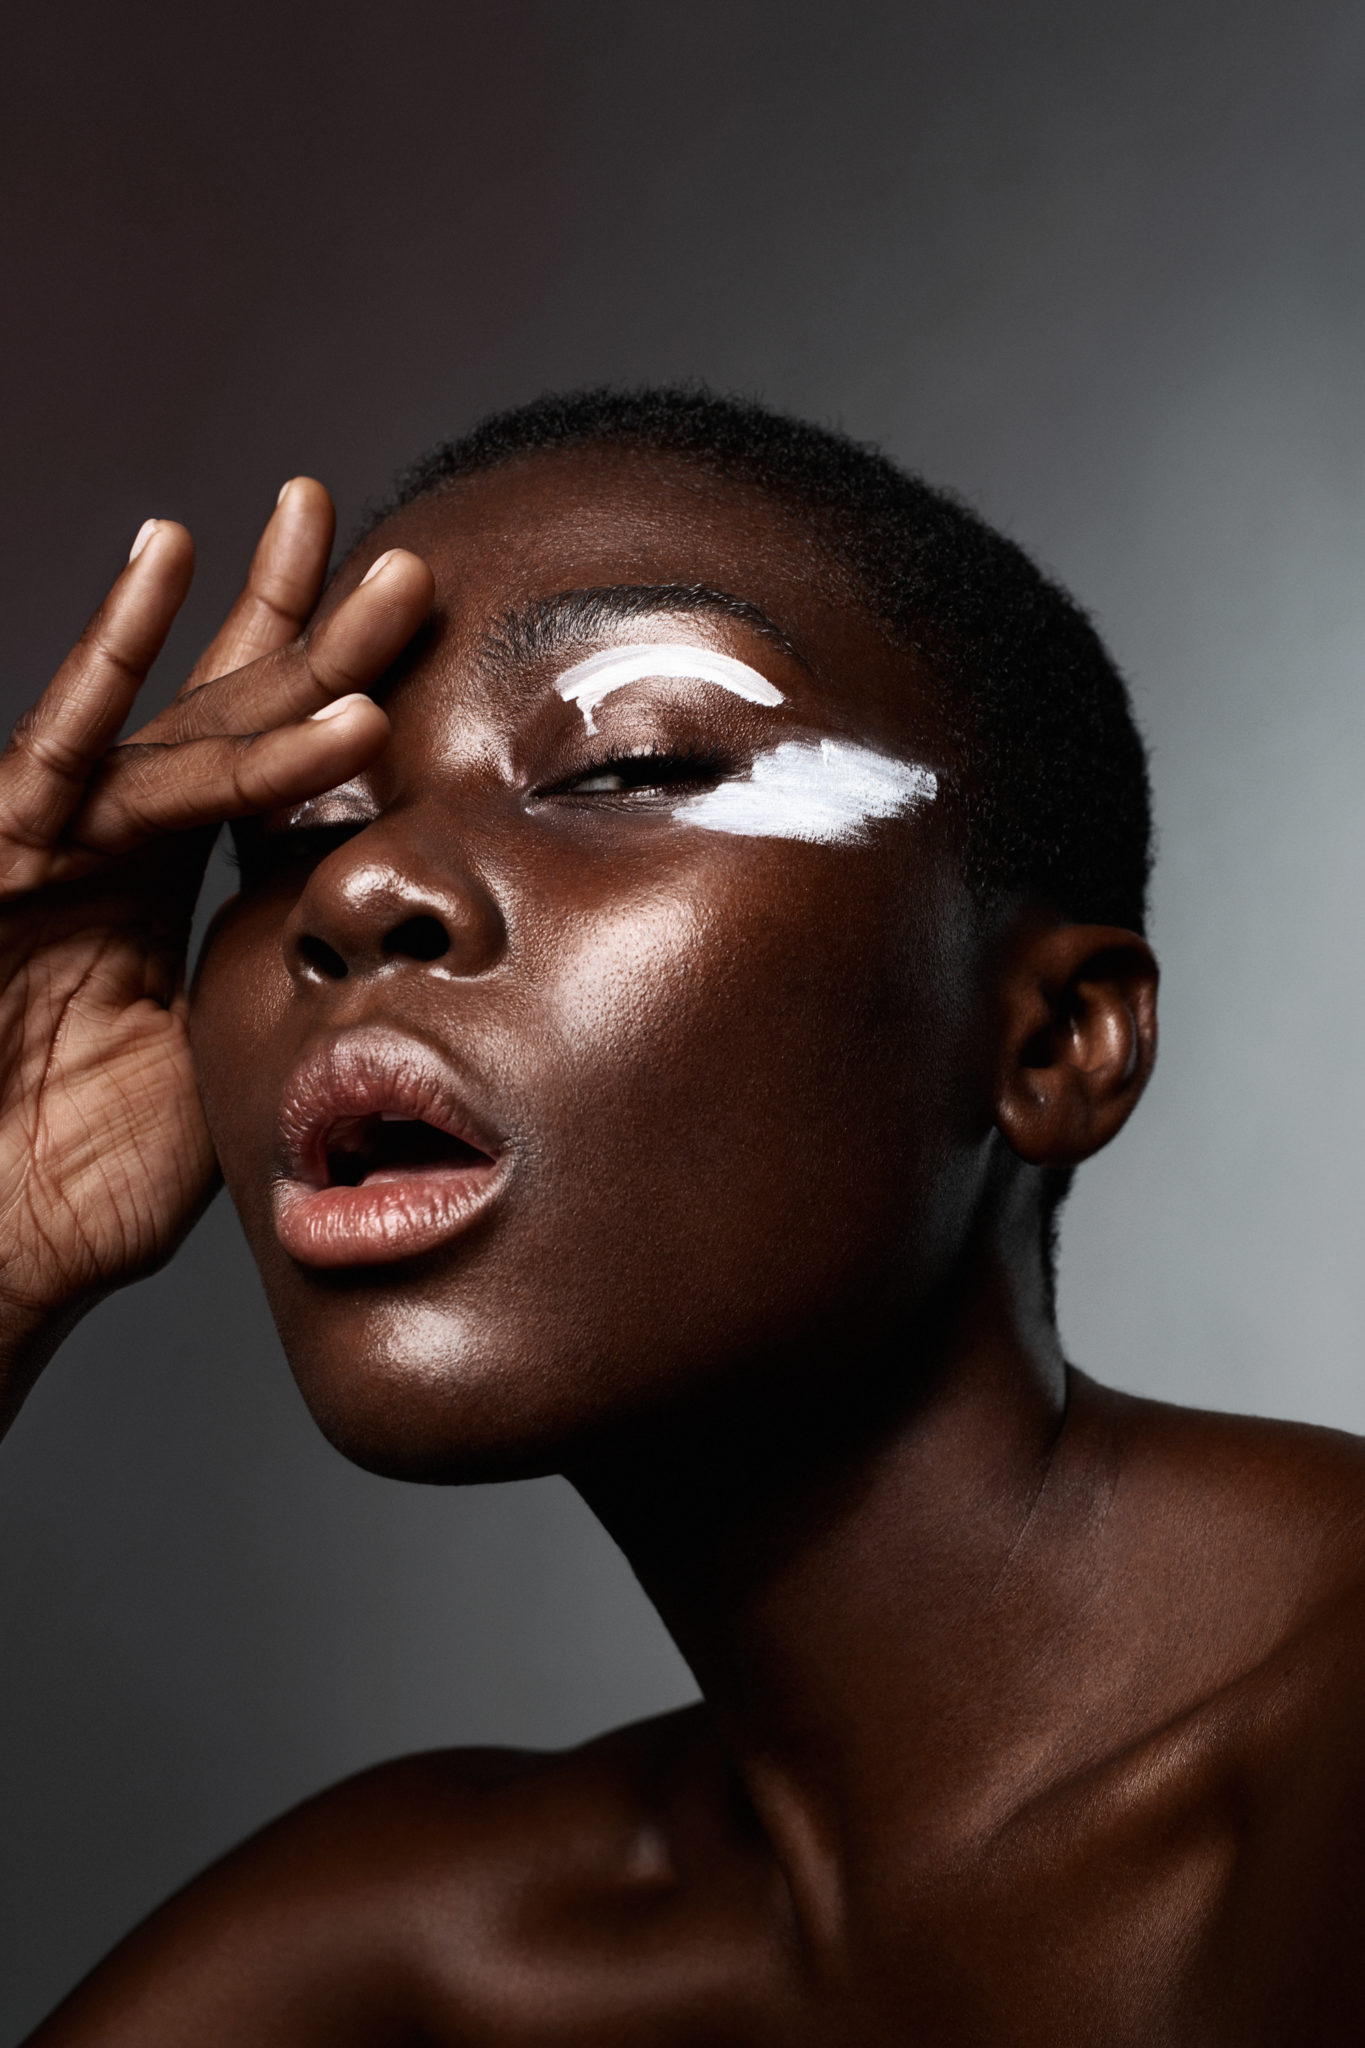 Color my face fashion story beauty editorial make up photography tina picard le dernier etage magazine webzine